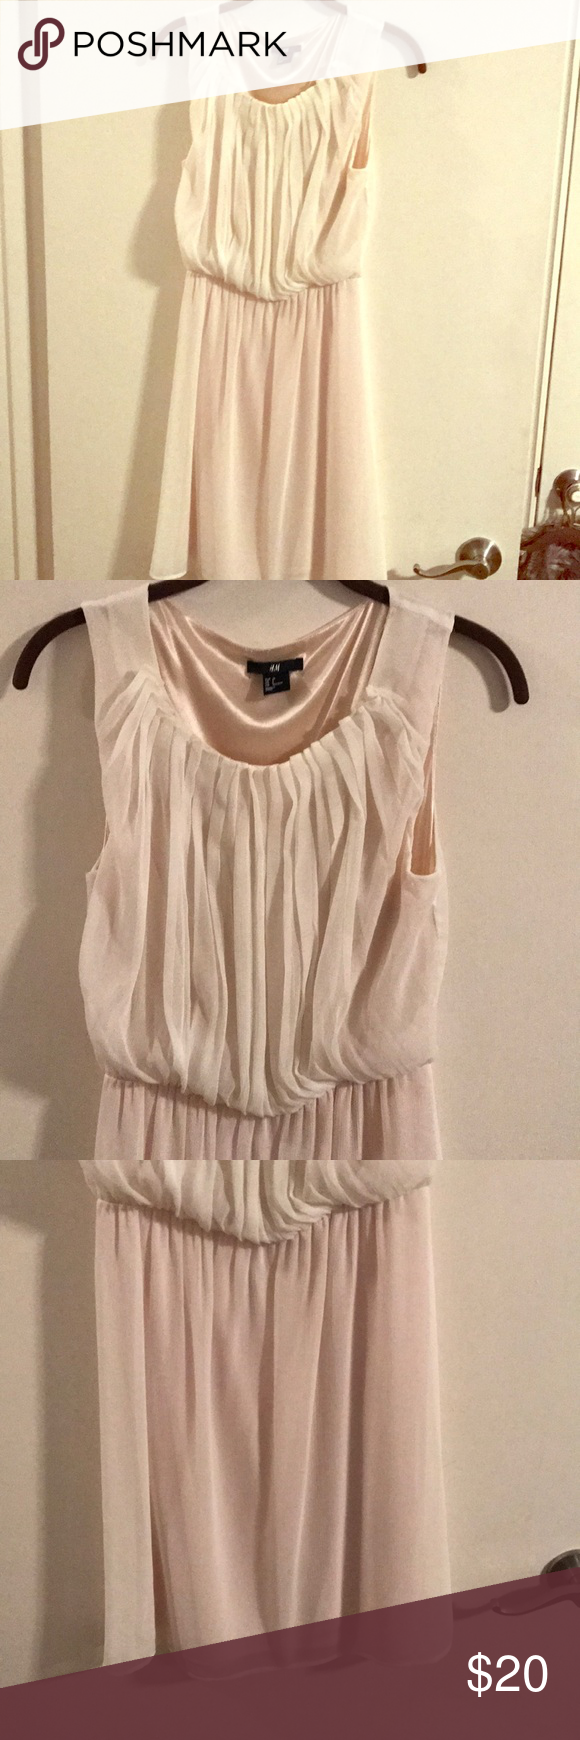 H&m pink pleated dress  HuM ivory lined dress Pleated top simple ivory dress Knee length